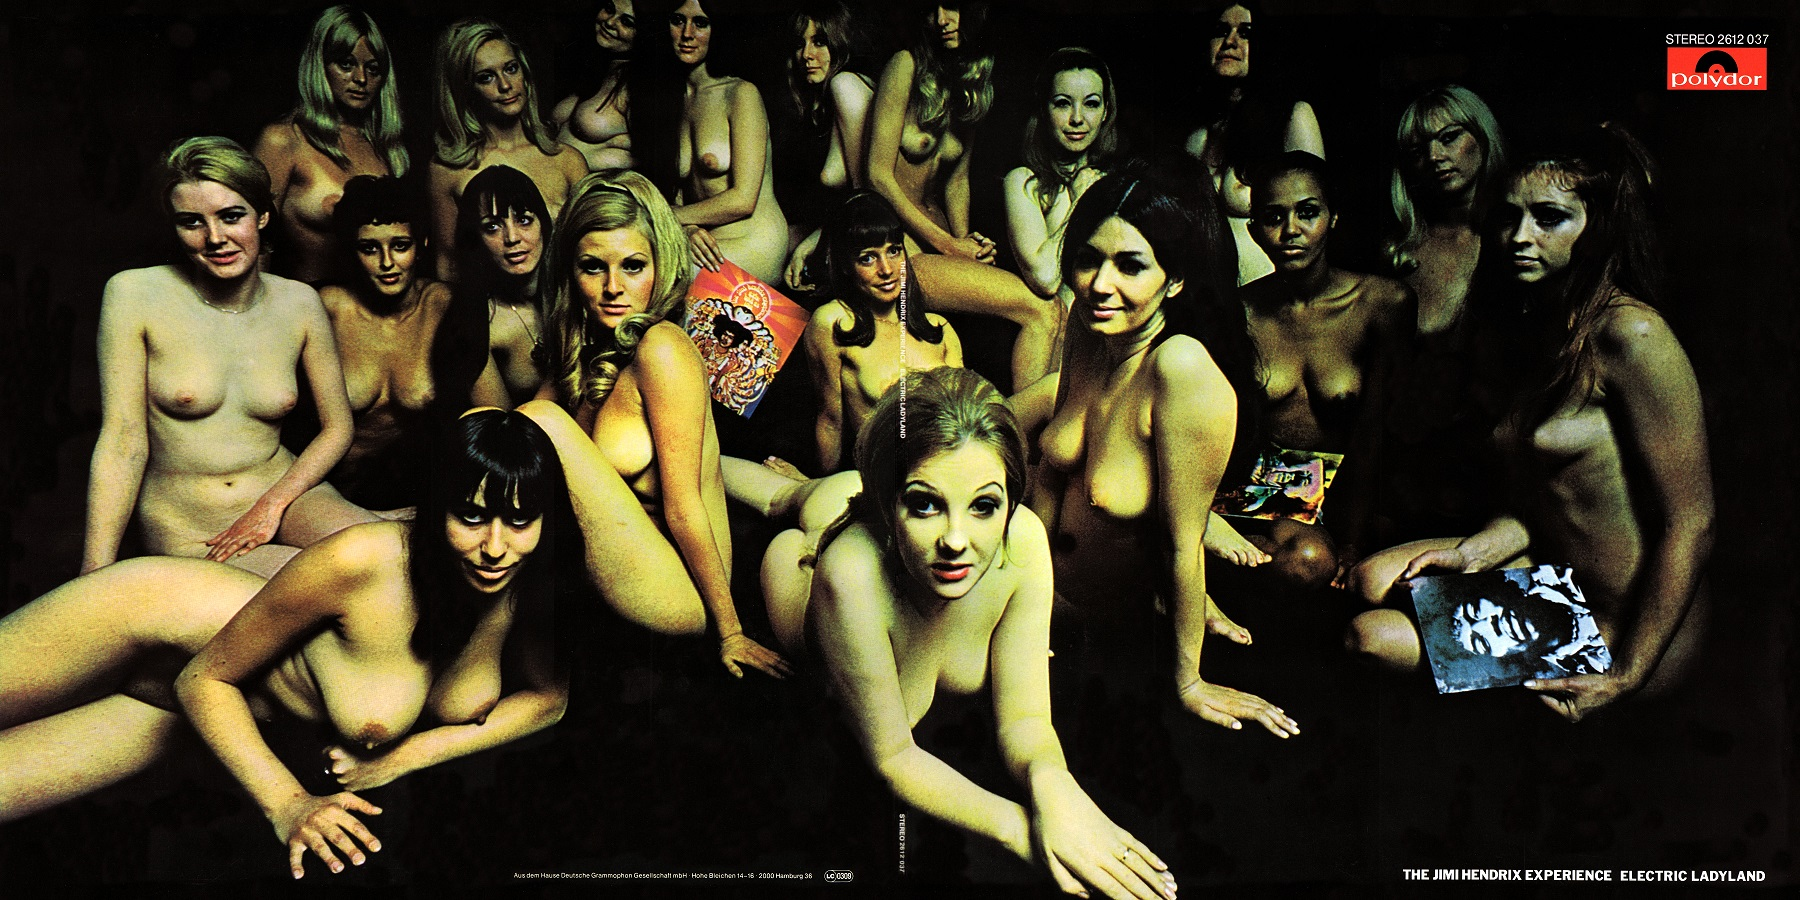 A rodar XXXIII - Página 6 Jimi-hendrix-electric-ladyland-naked-women-wallpaper